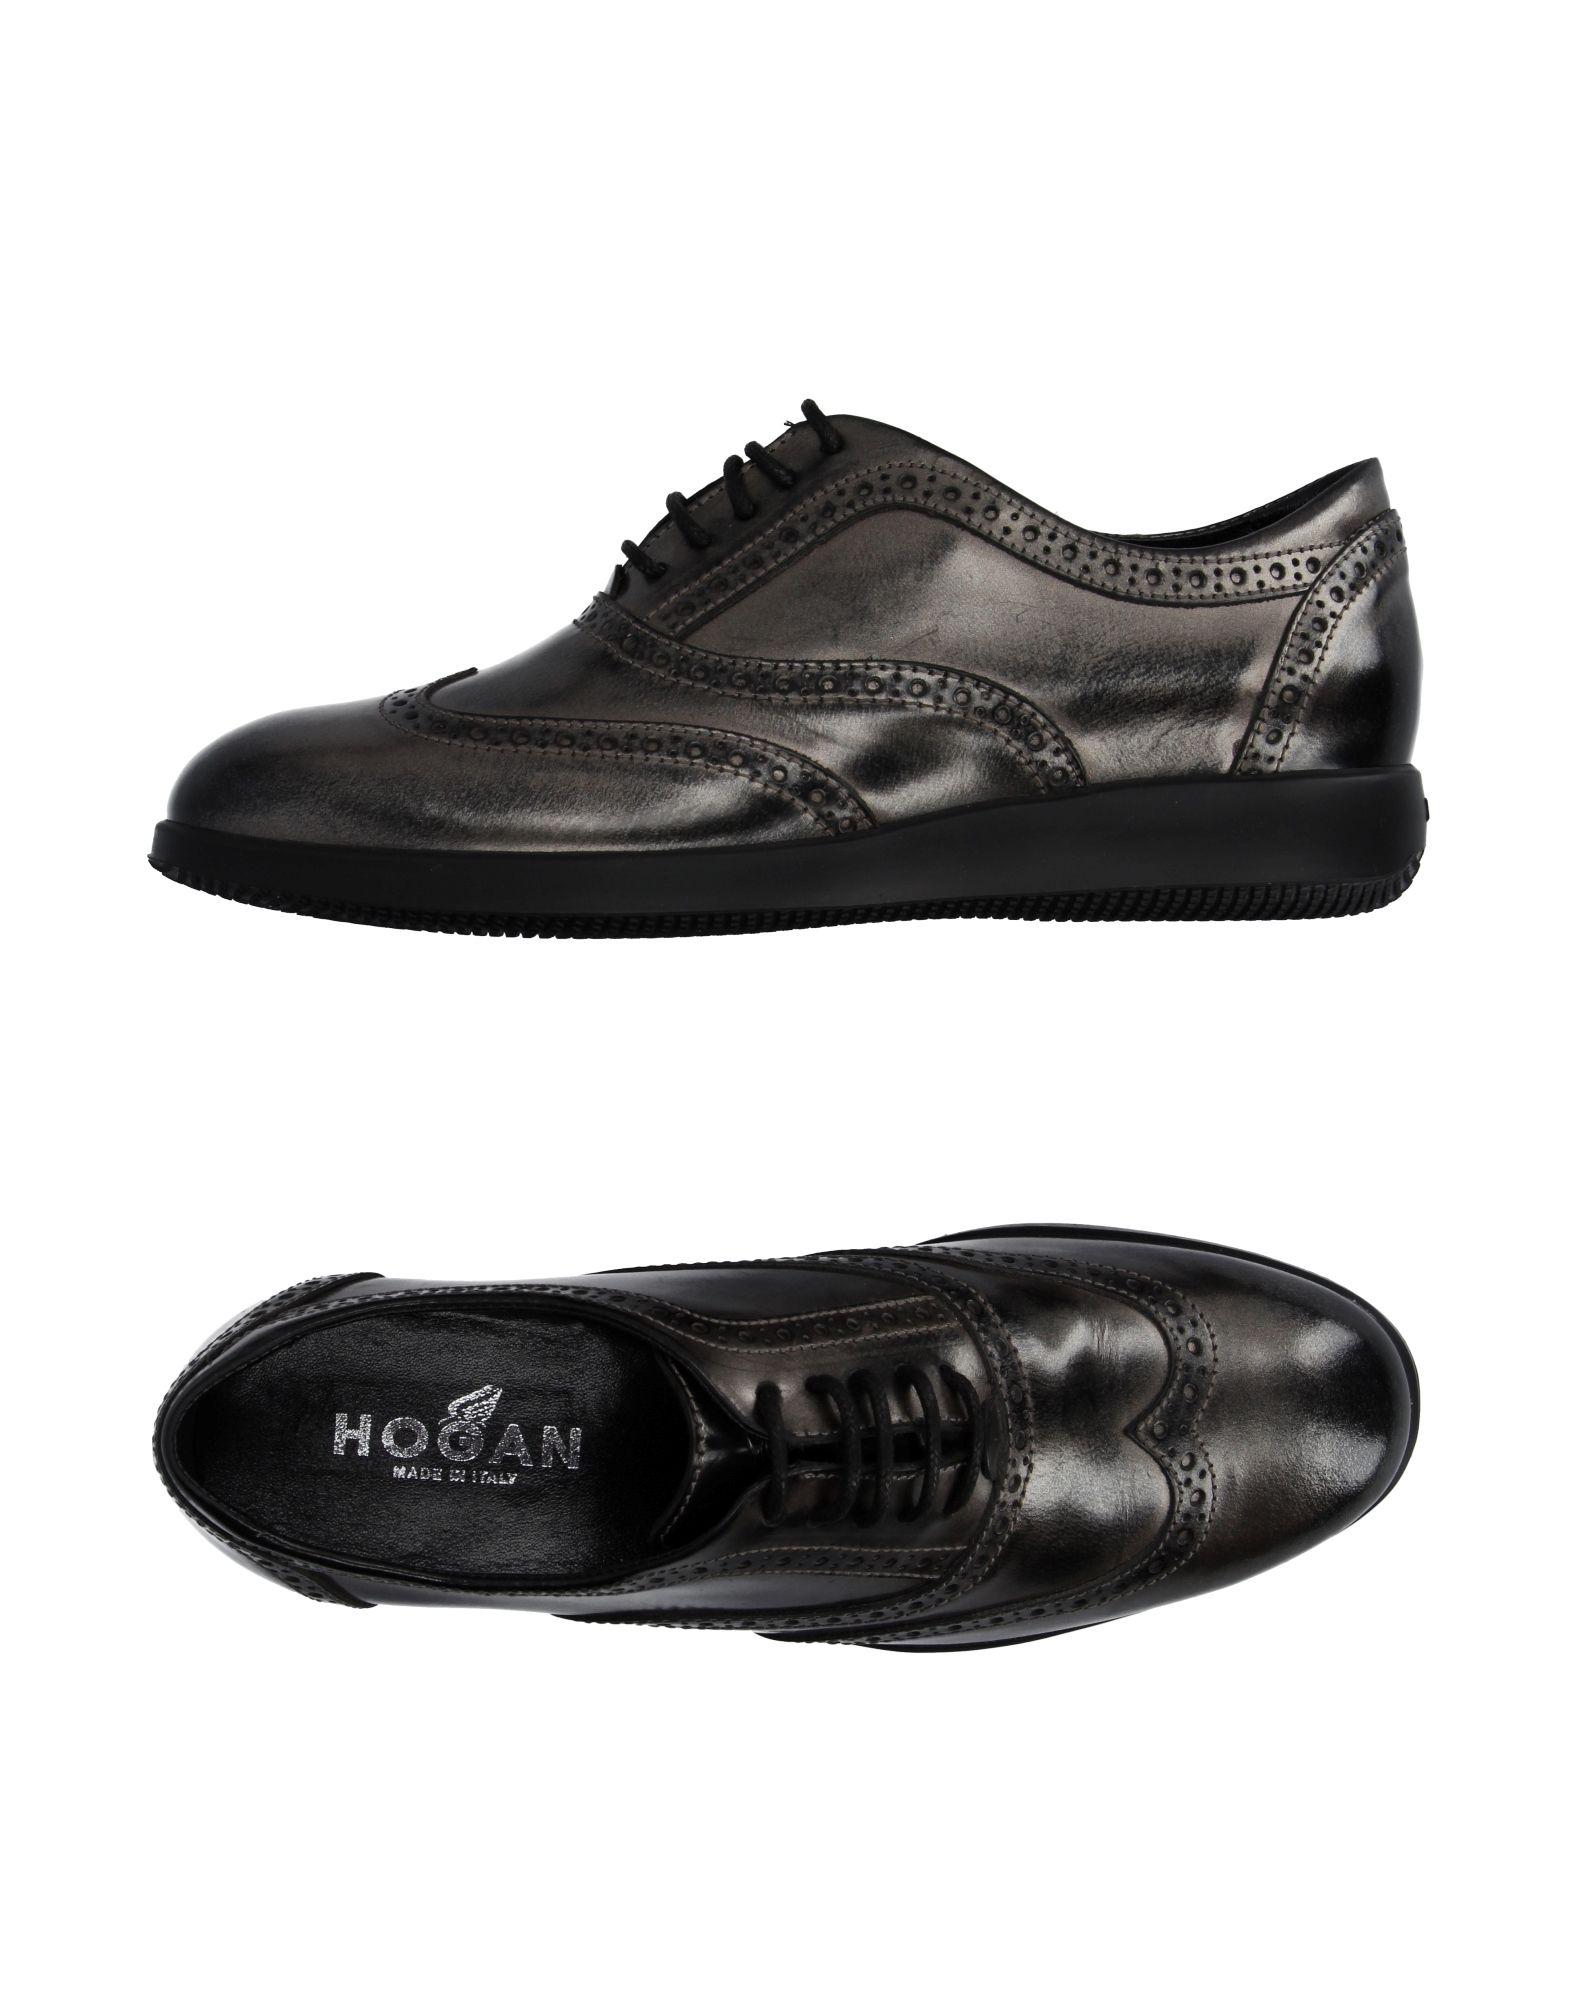 Moda Stringate Hogan Donna - 11030064WC